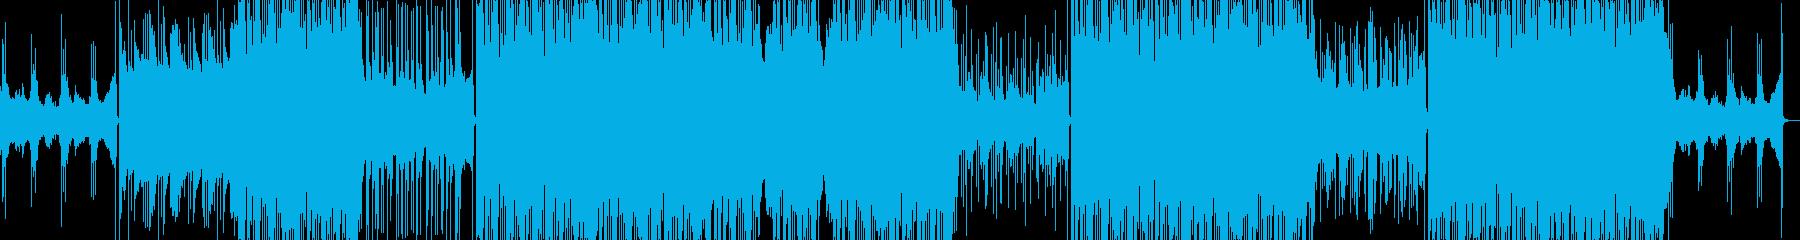 R&B・HIPHOP・オシャレ・エモいの再生済みの波形